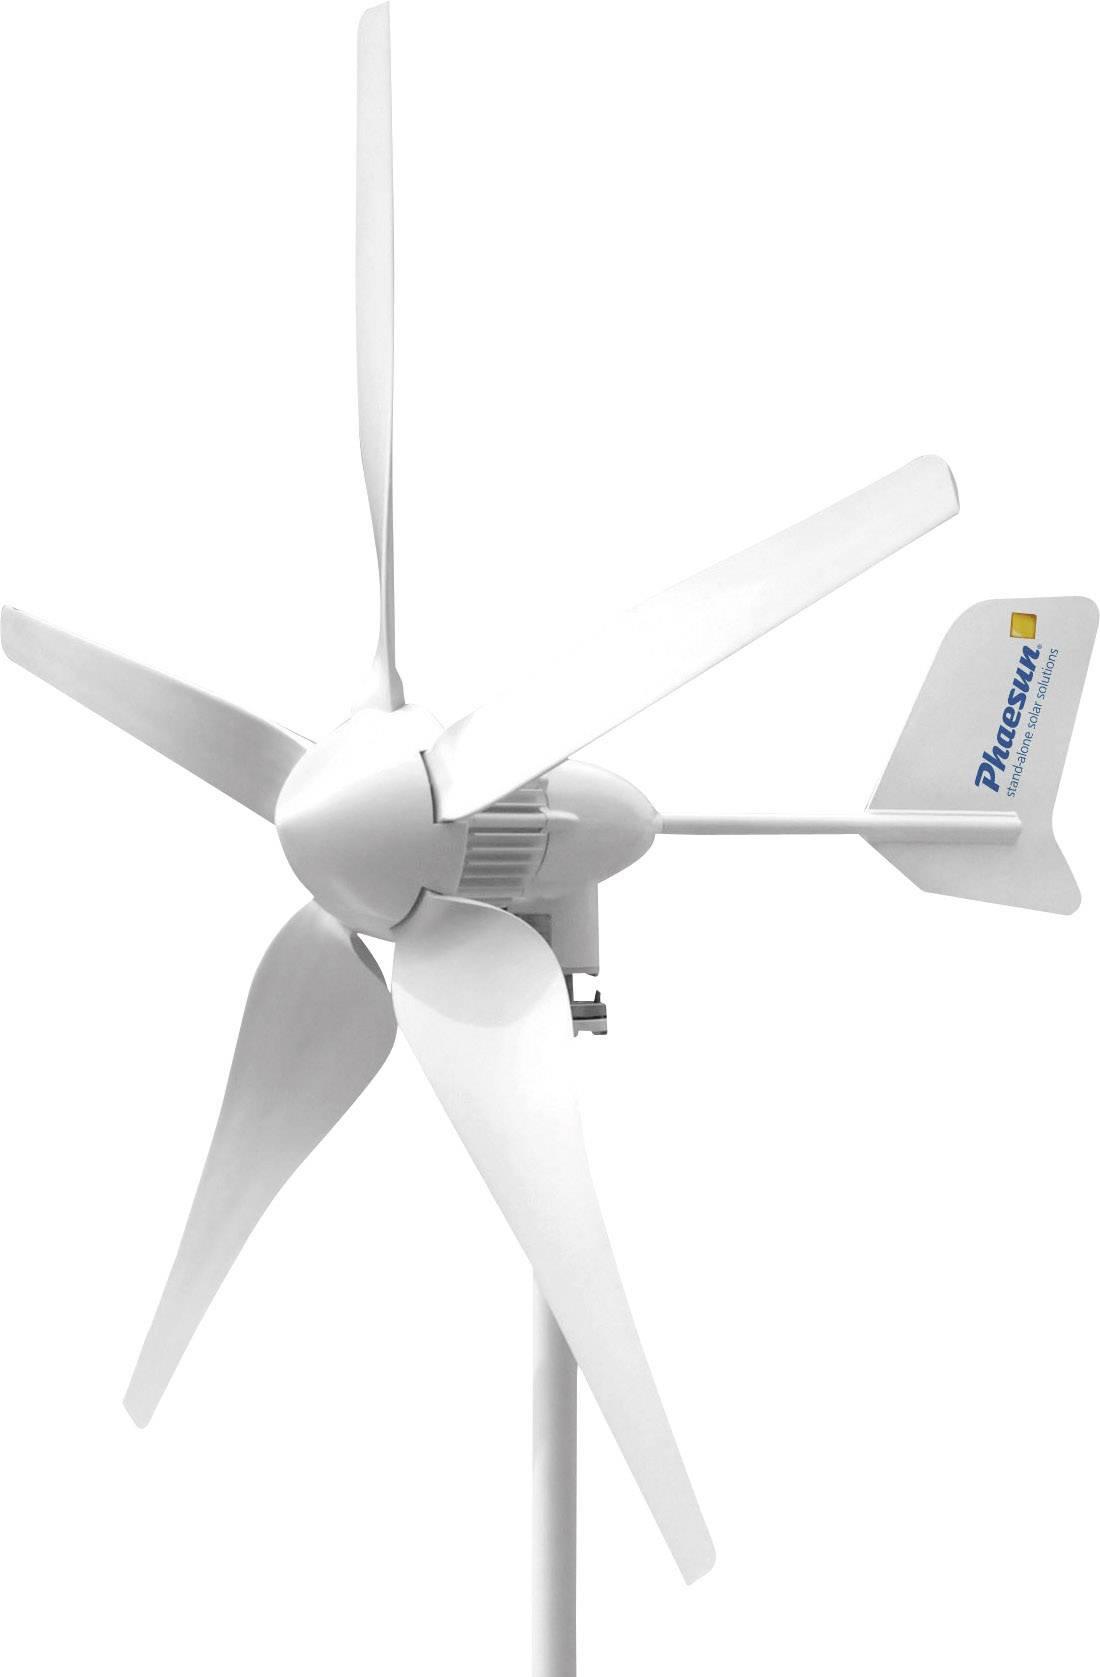 Větrný generátor pro mini elektrárnu Phaesun Stormy Wings 400_12 310125, výkon při (10m/s) 400 W